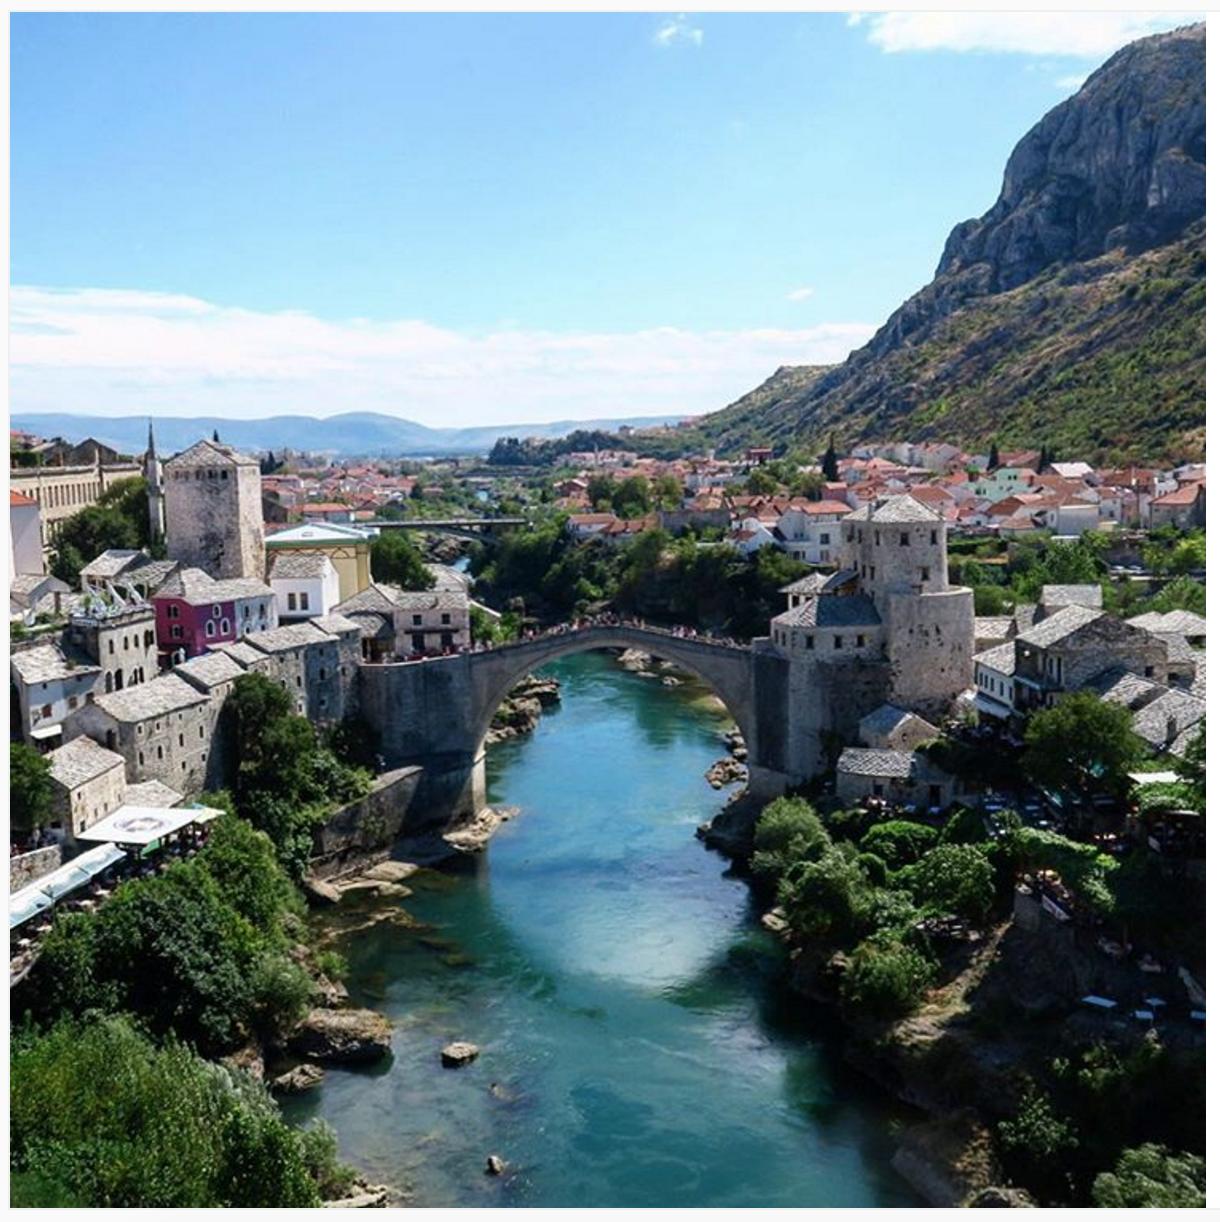 Old Bridge in Mostar